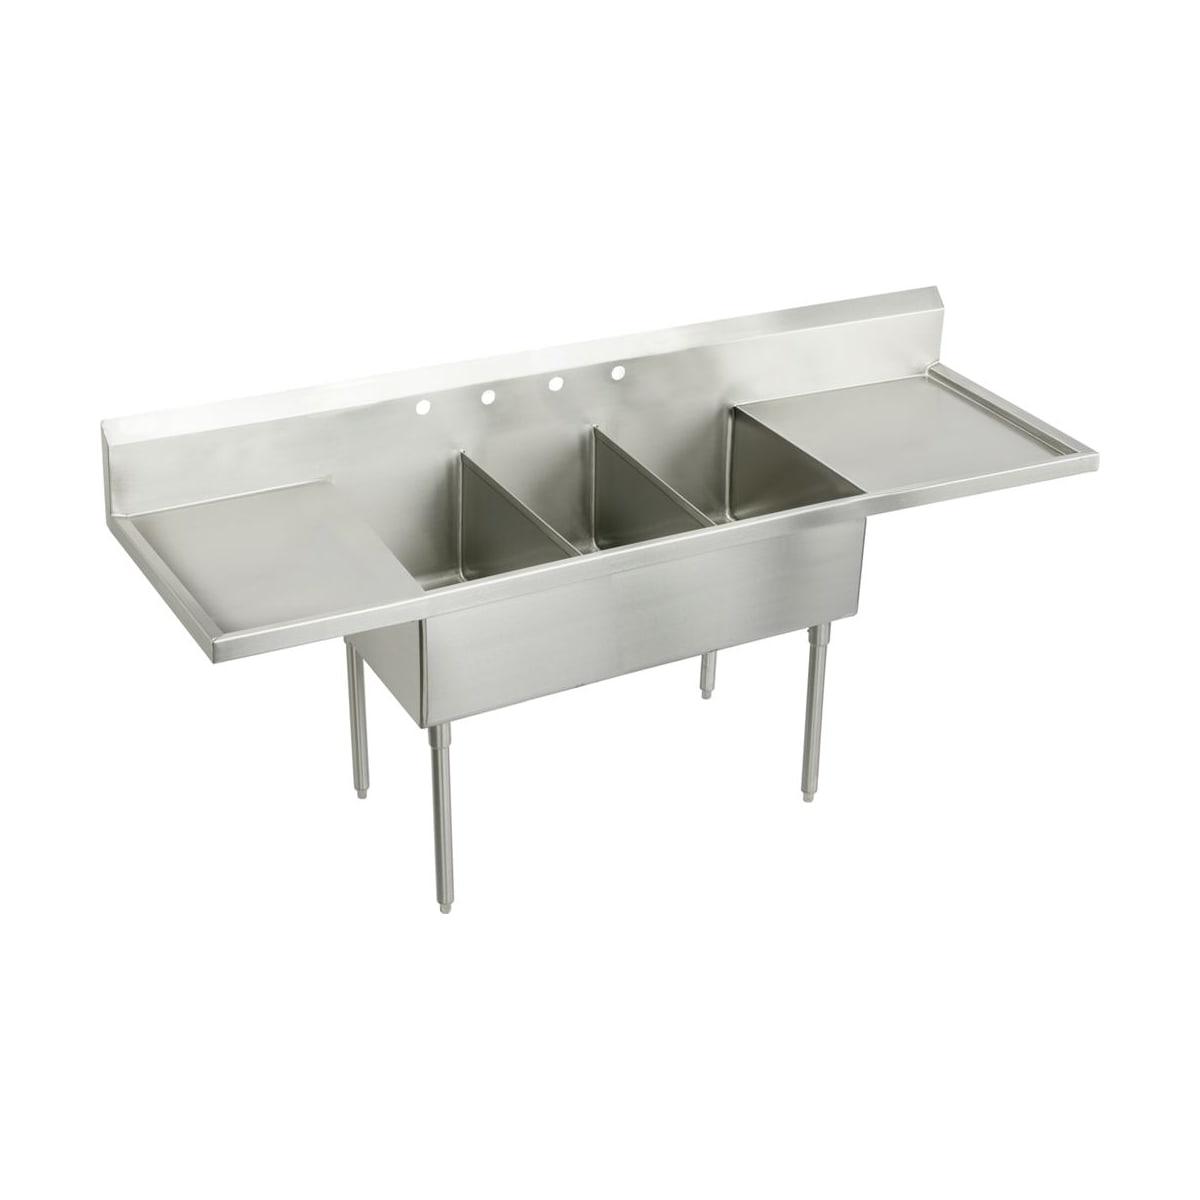 Elkay Wnsf8354lrof4 4 Faucet Holes Weldbilt 102 Triple Basin Free Standing Stainless Steel Utility Sink Faucetdirect Com